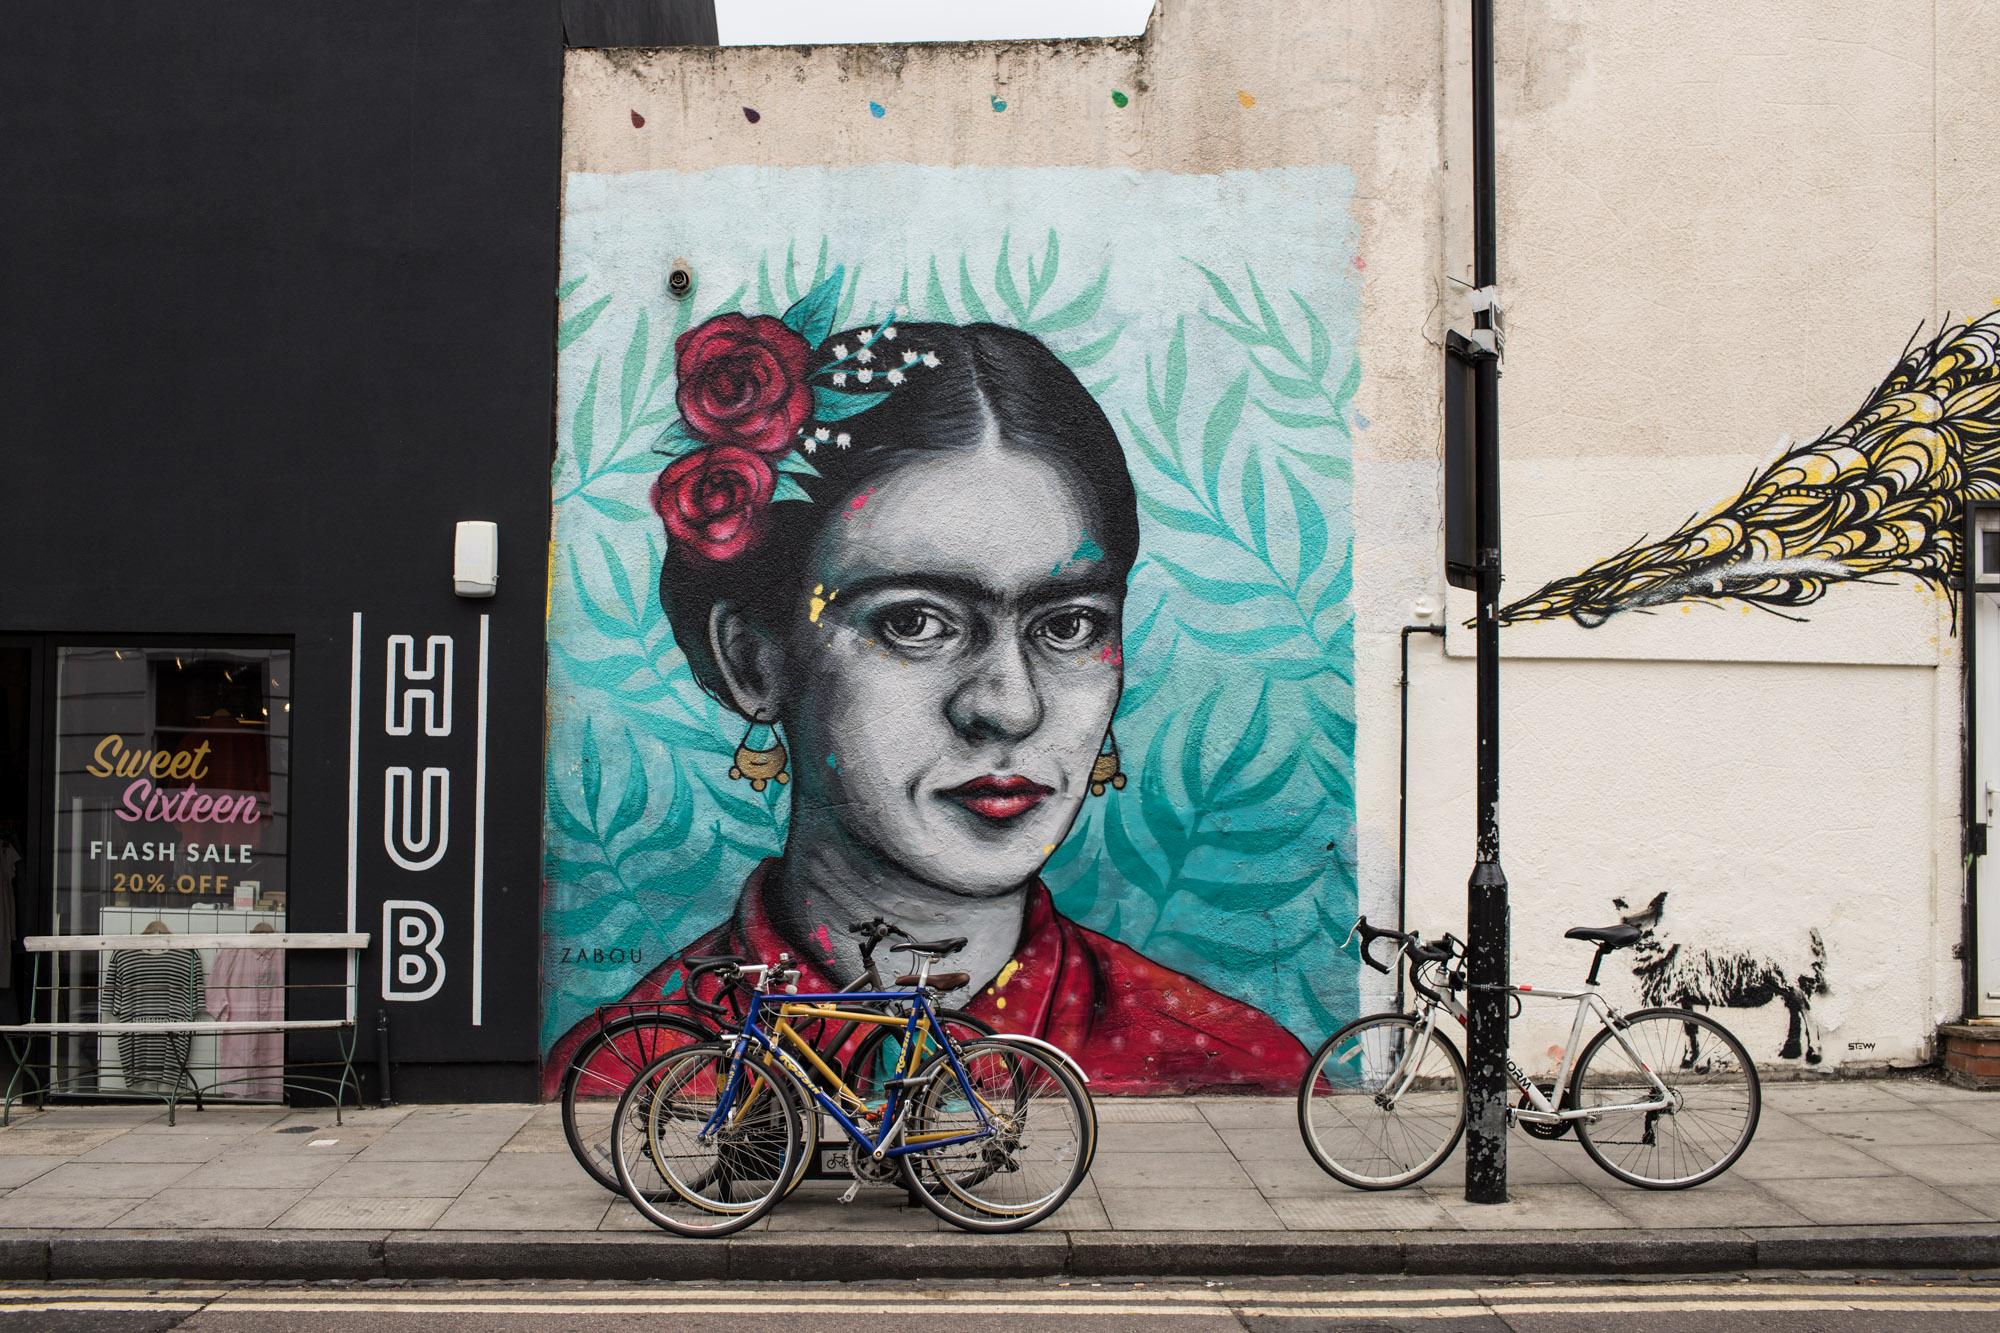 Londen dag 2